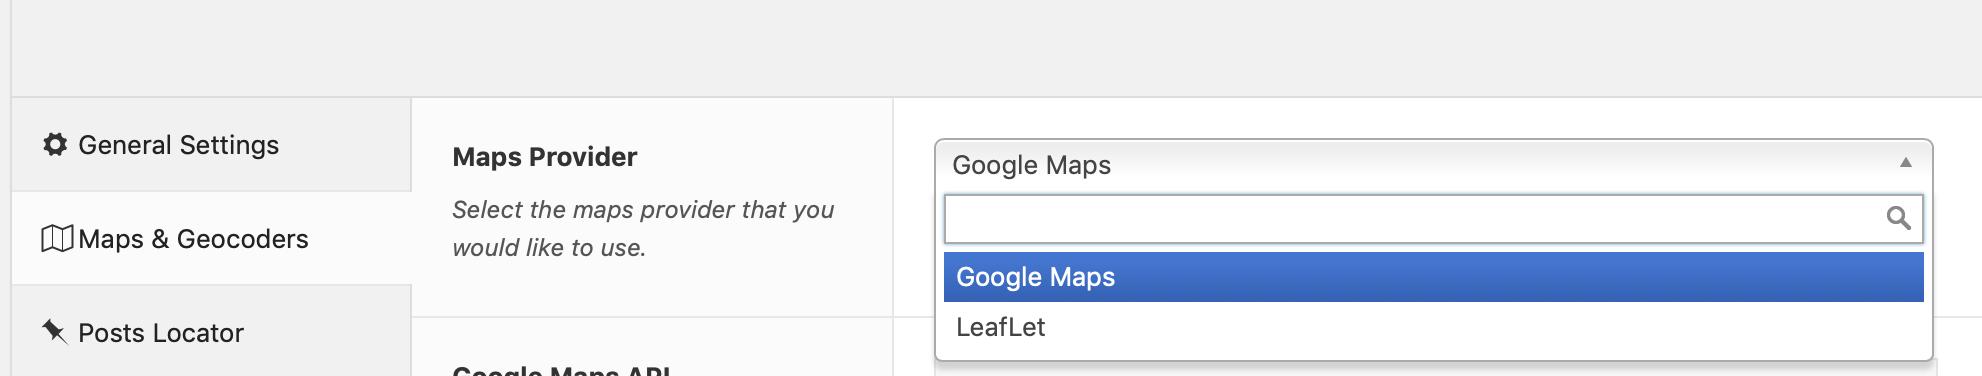 Maps & Geocoder Settings - GEO my WP Knowledge Base